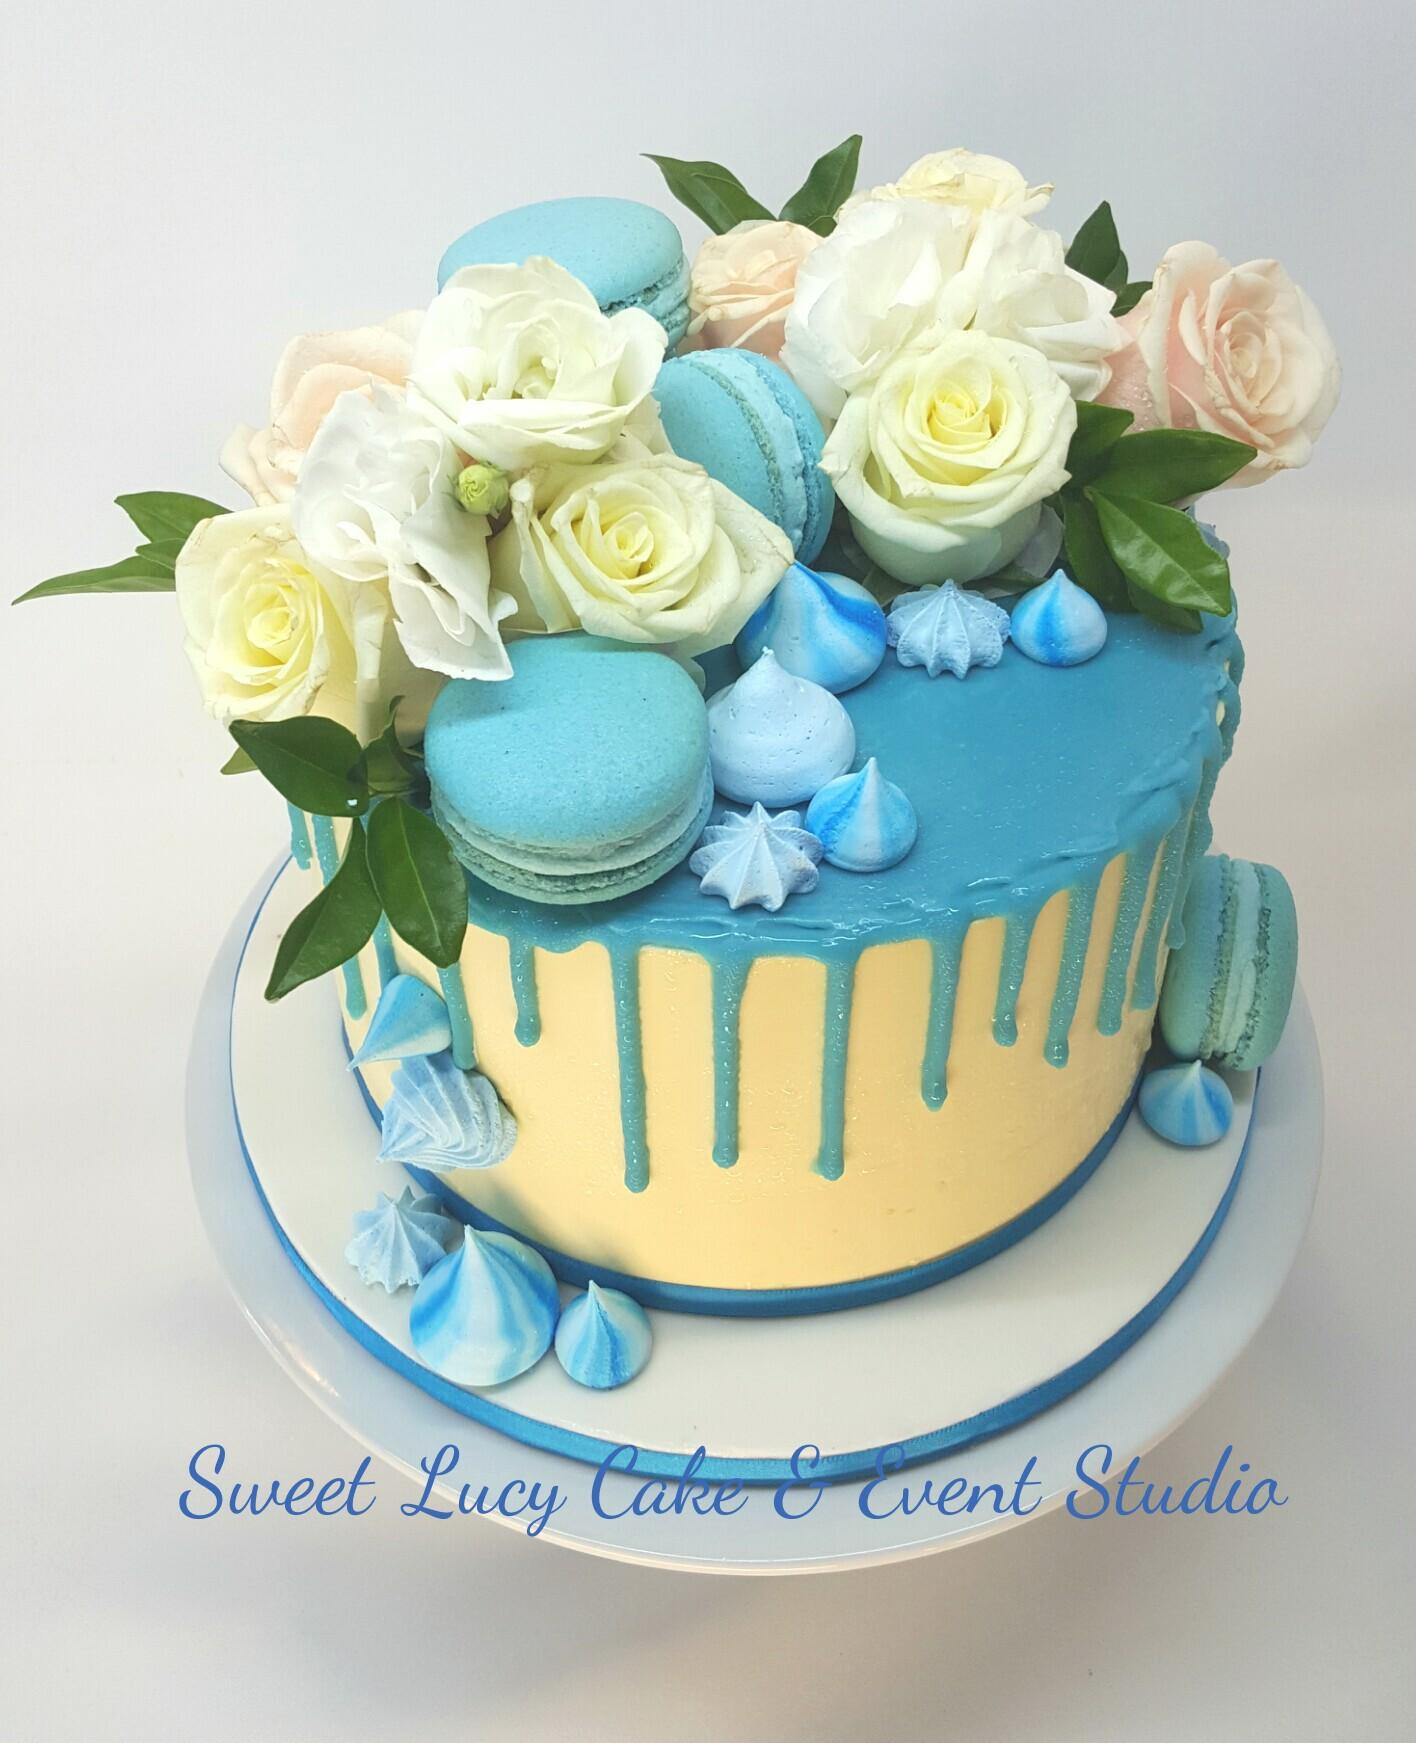 Blue Macarons & White Roses